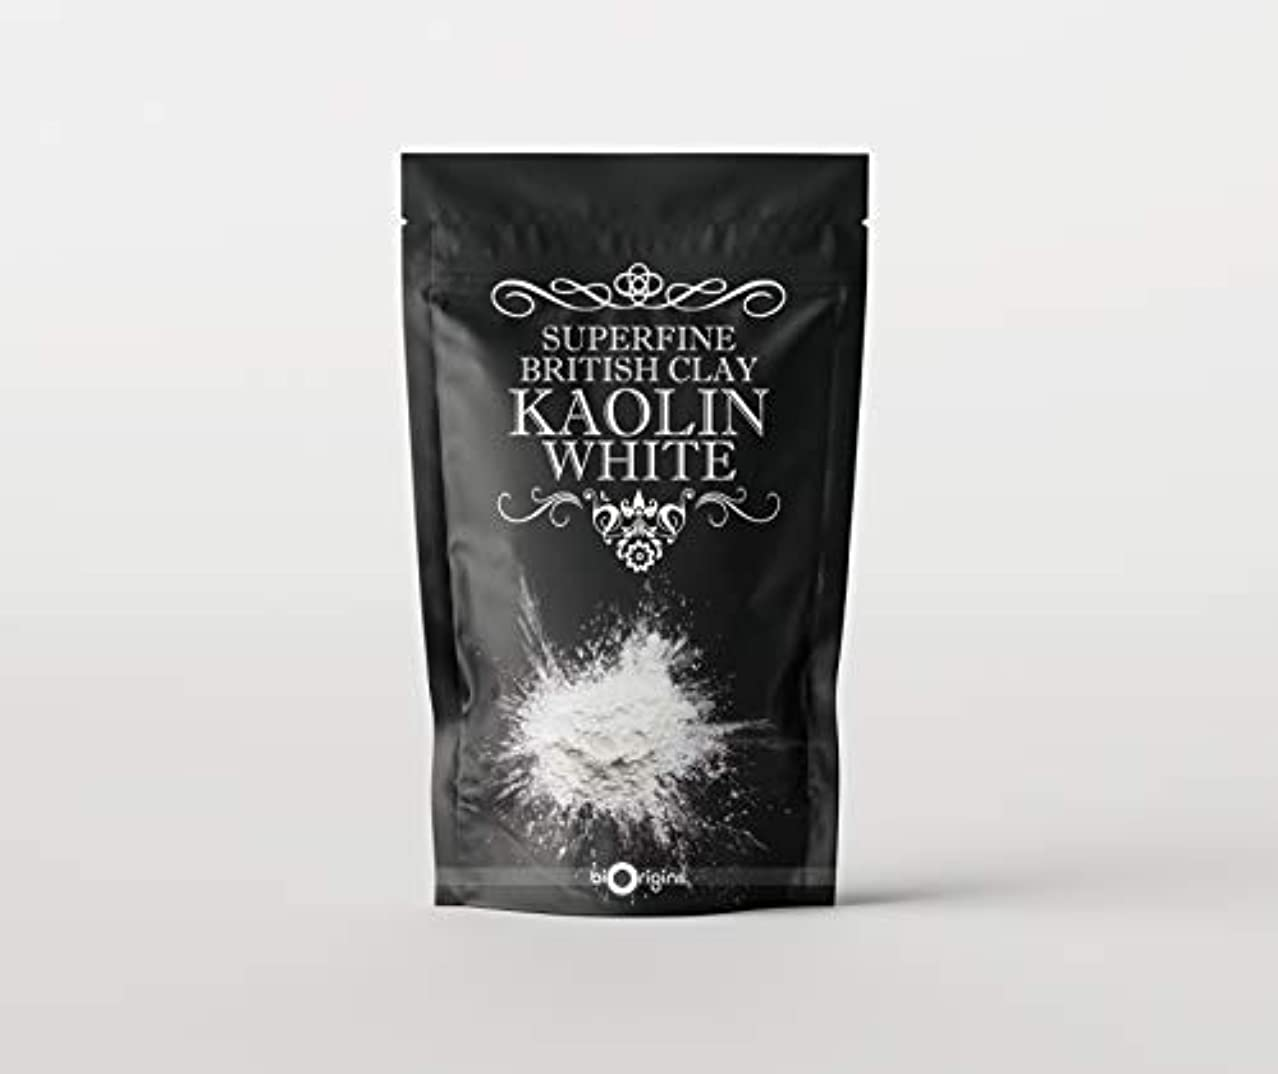 Kaolin White Superfine British Clay - 500g